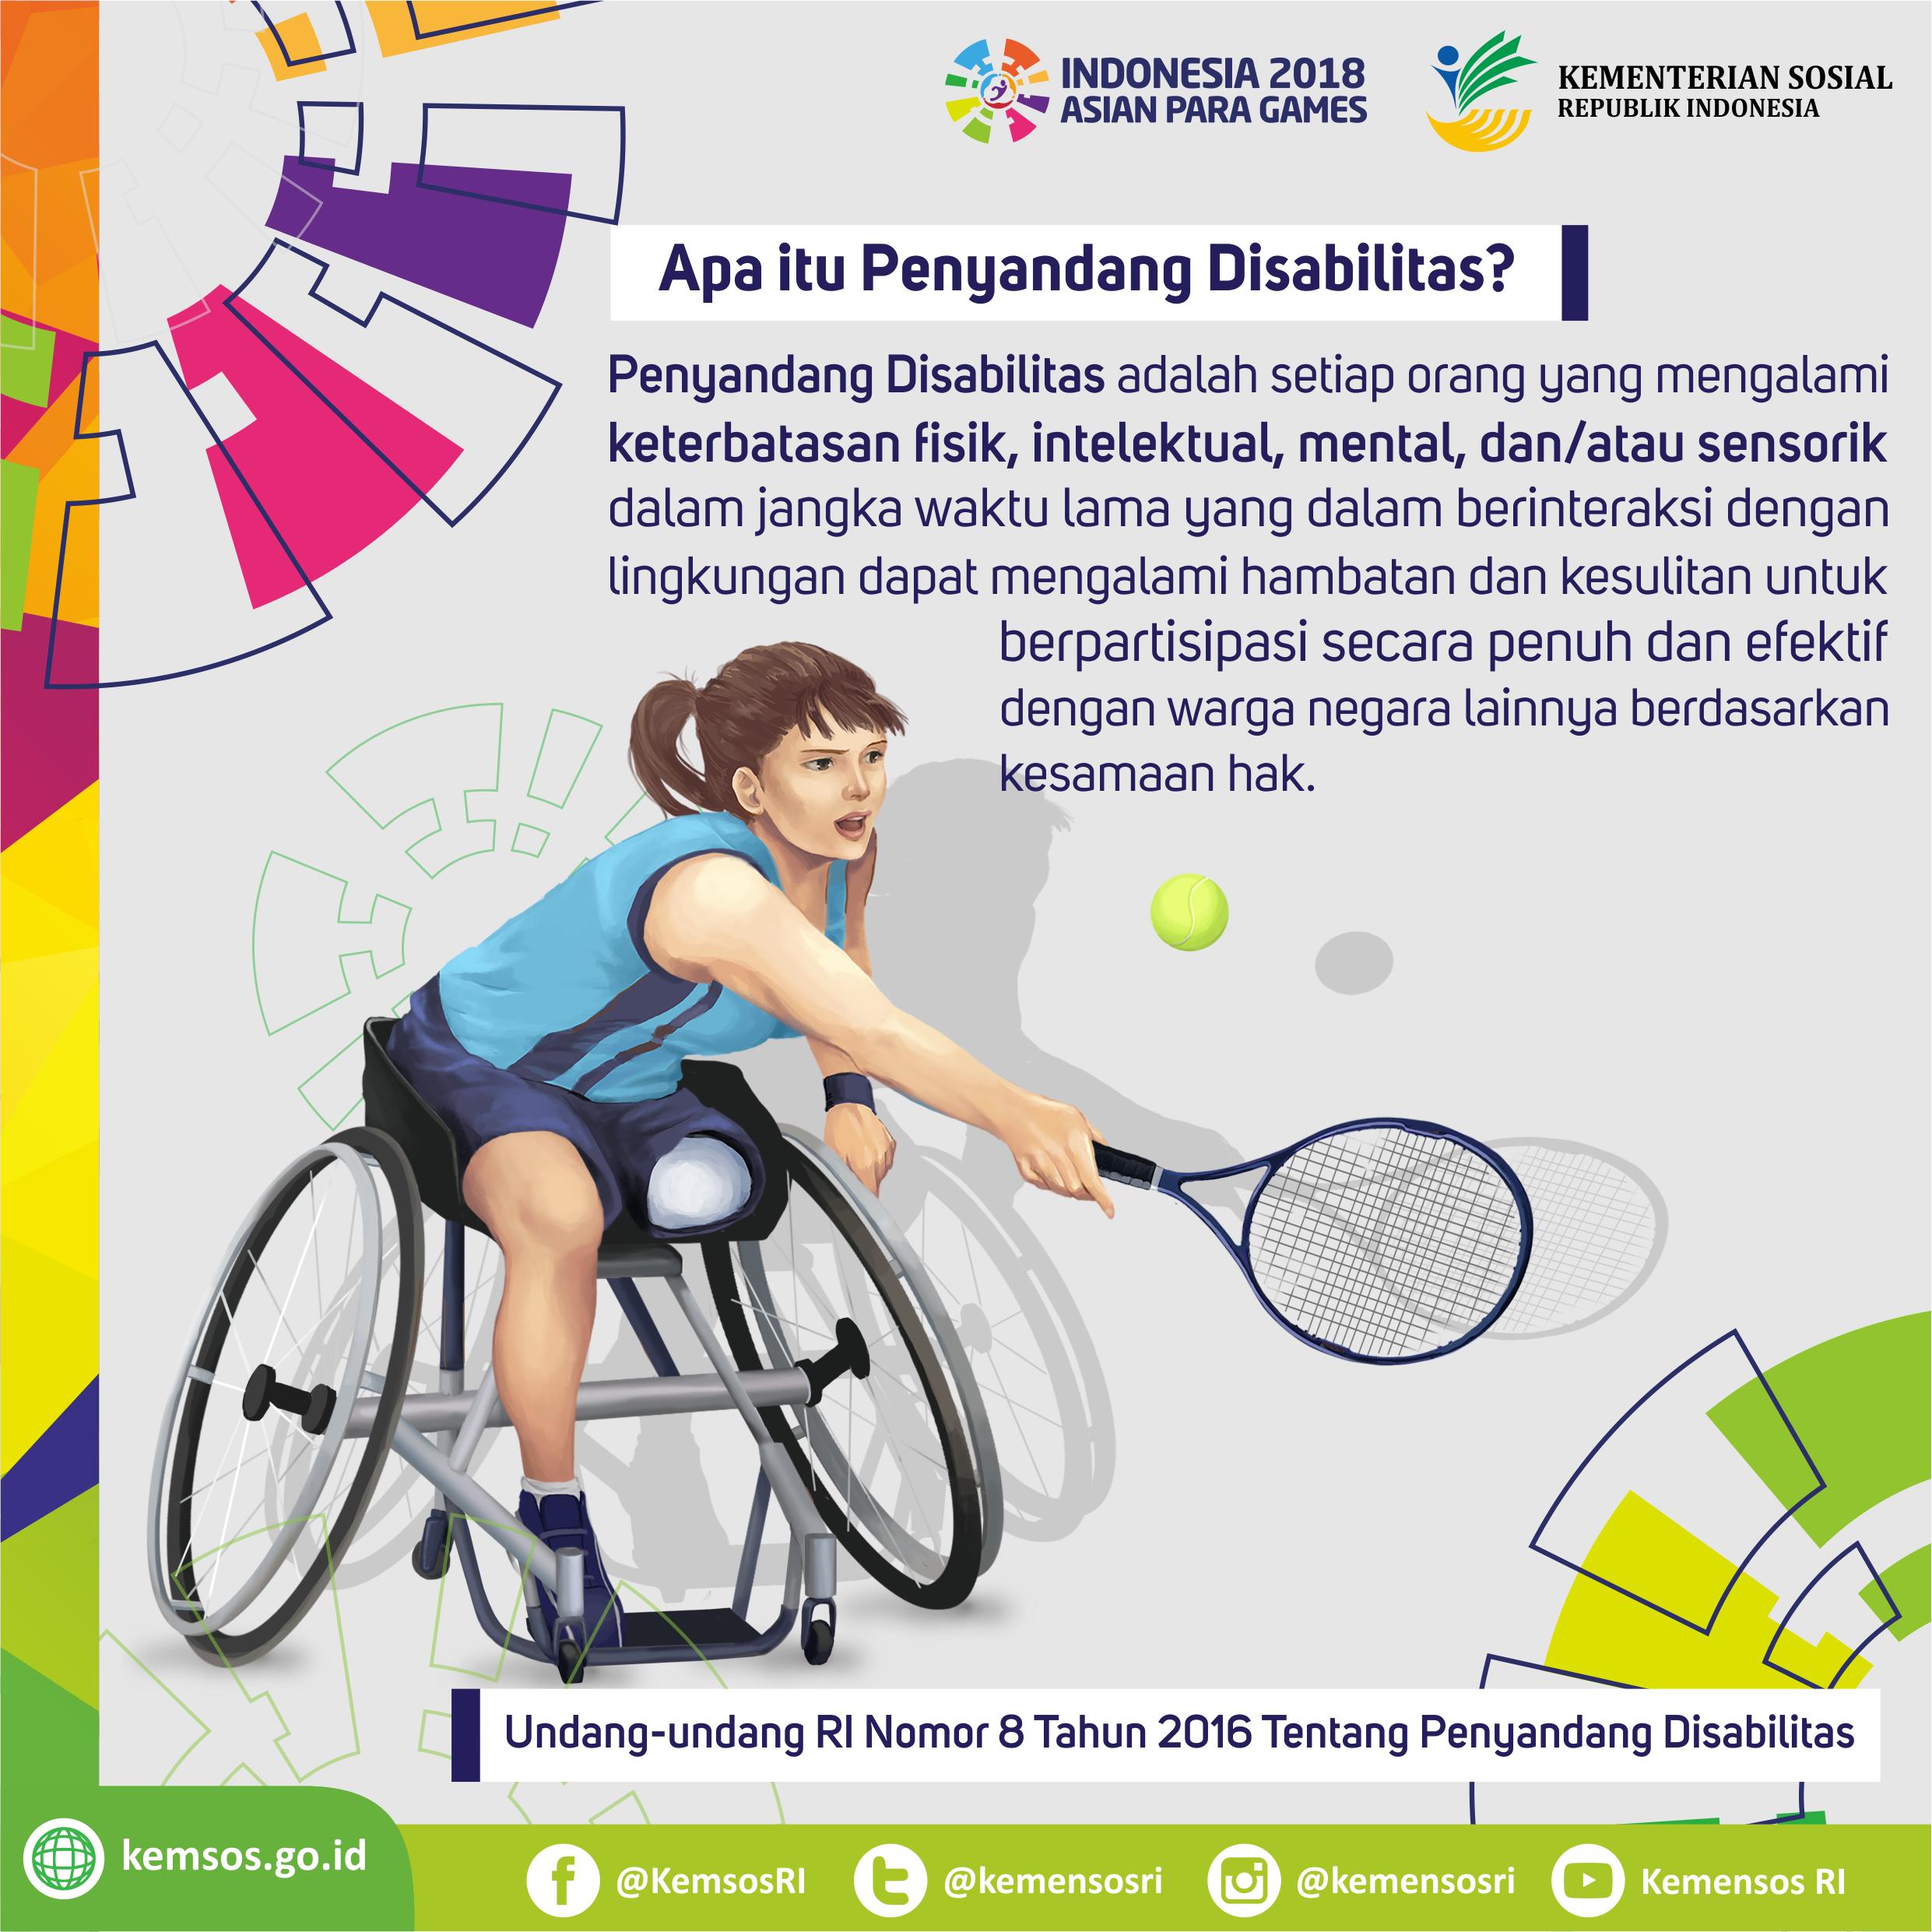 Definisi Penyandang Disabilitas